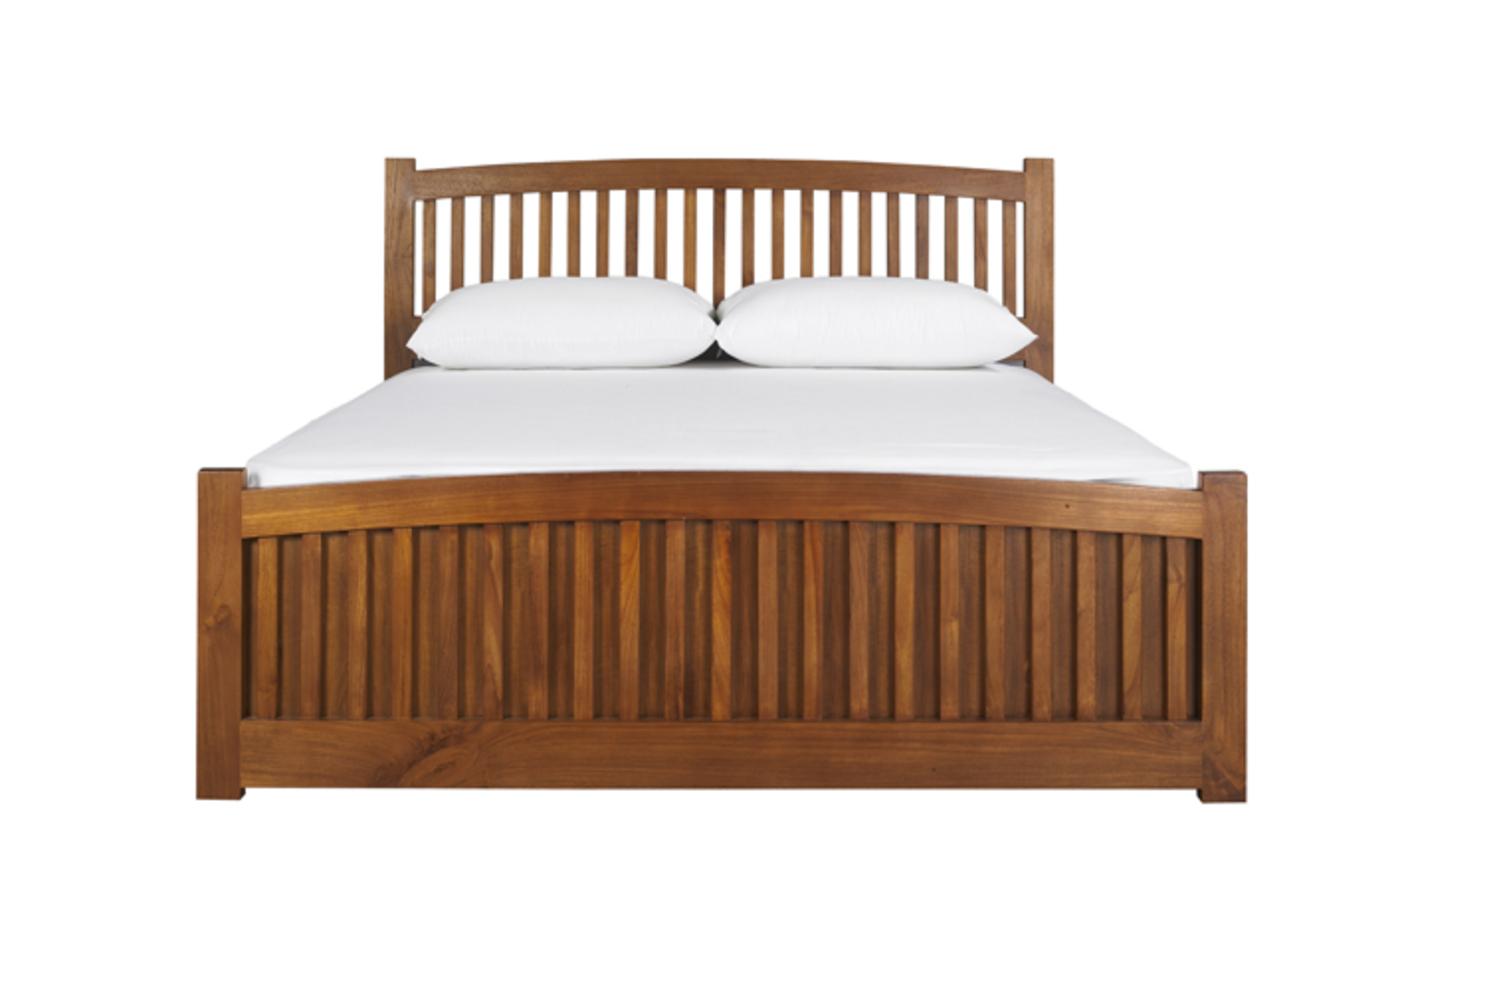 G款柚木實木床架 北歐風格臥室單品